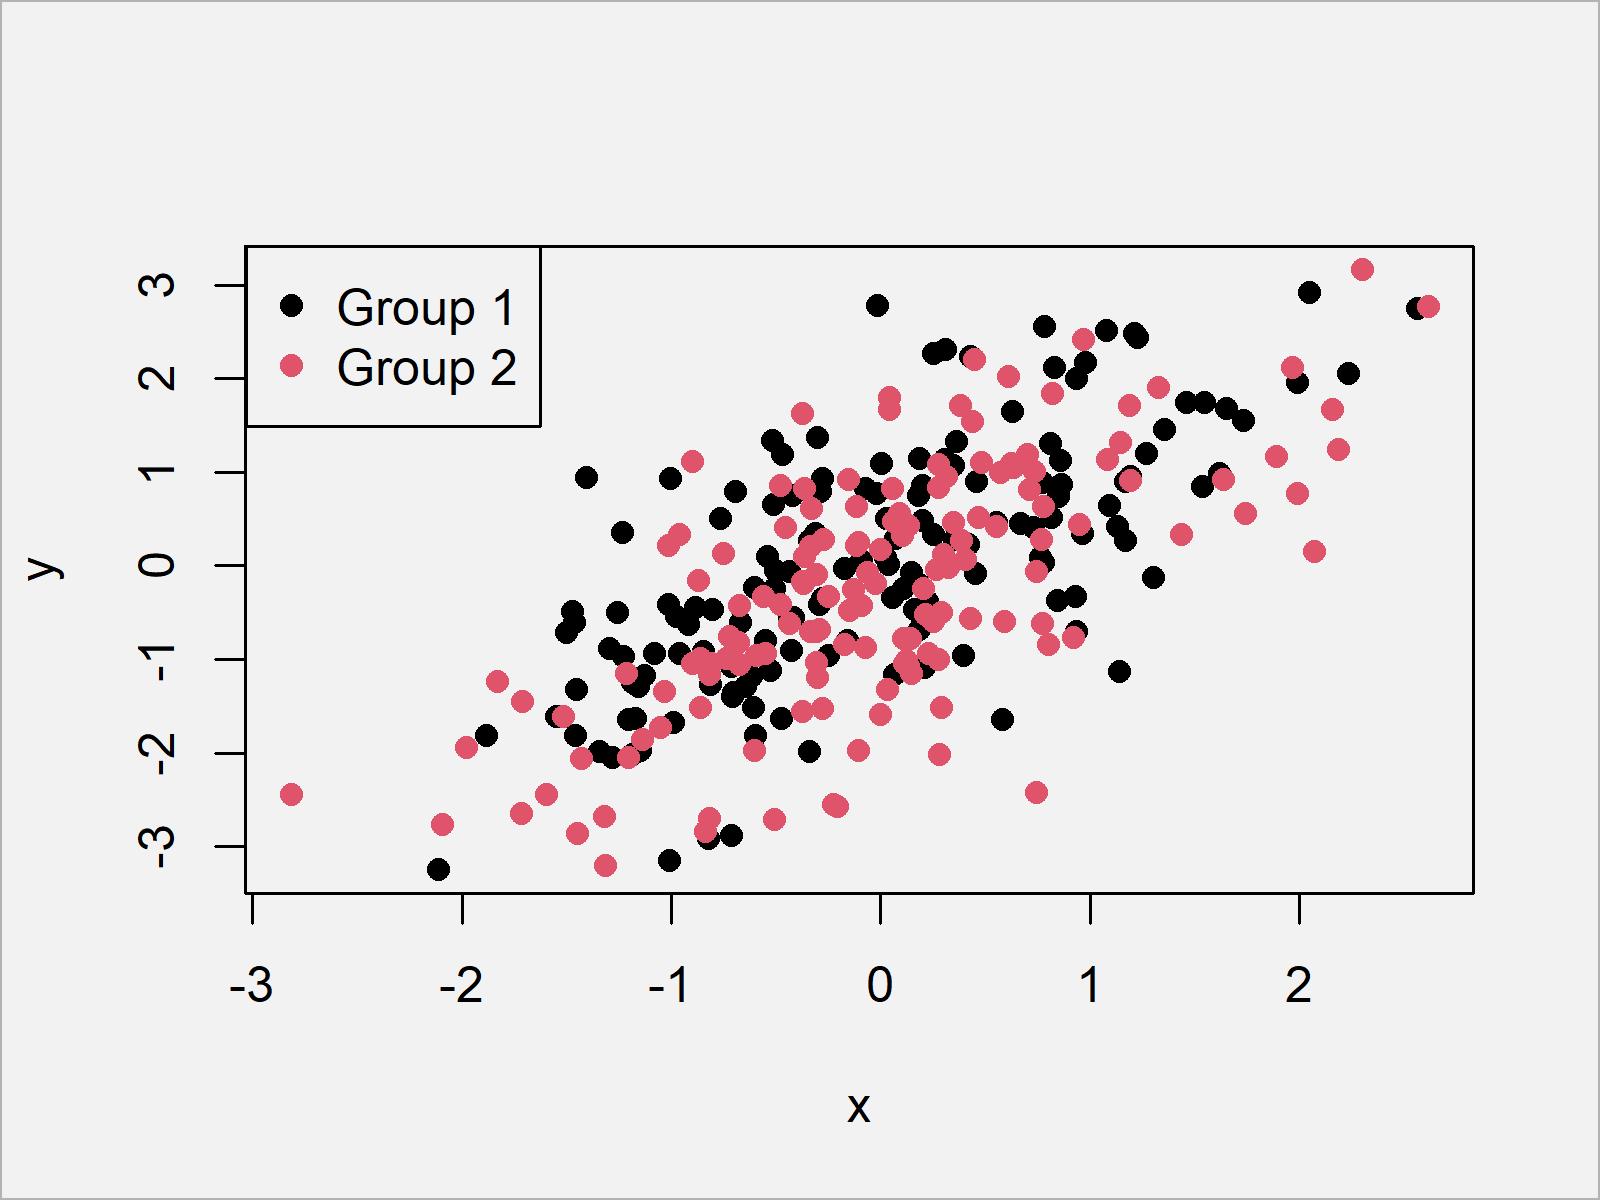 r graph figure 2 add legend base